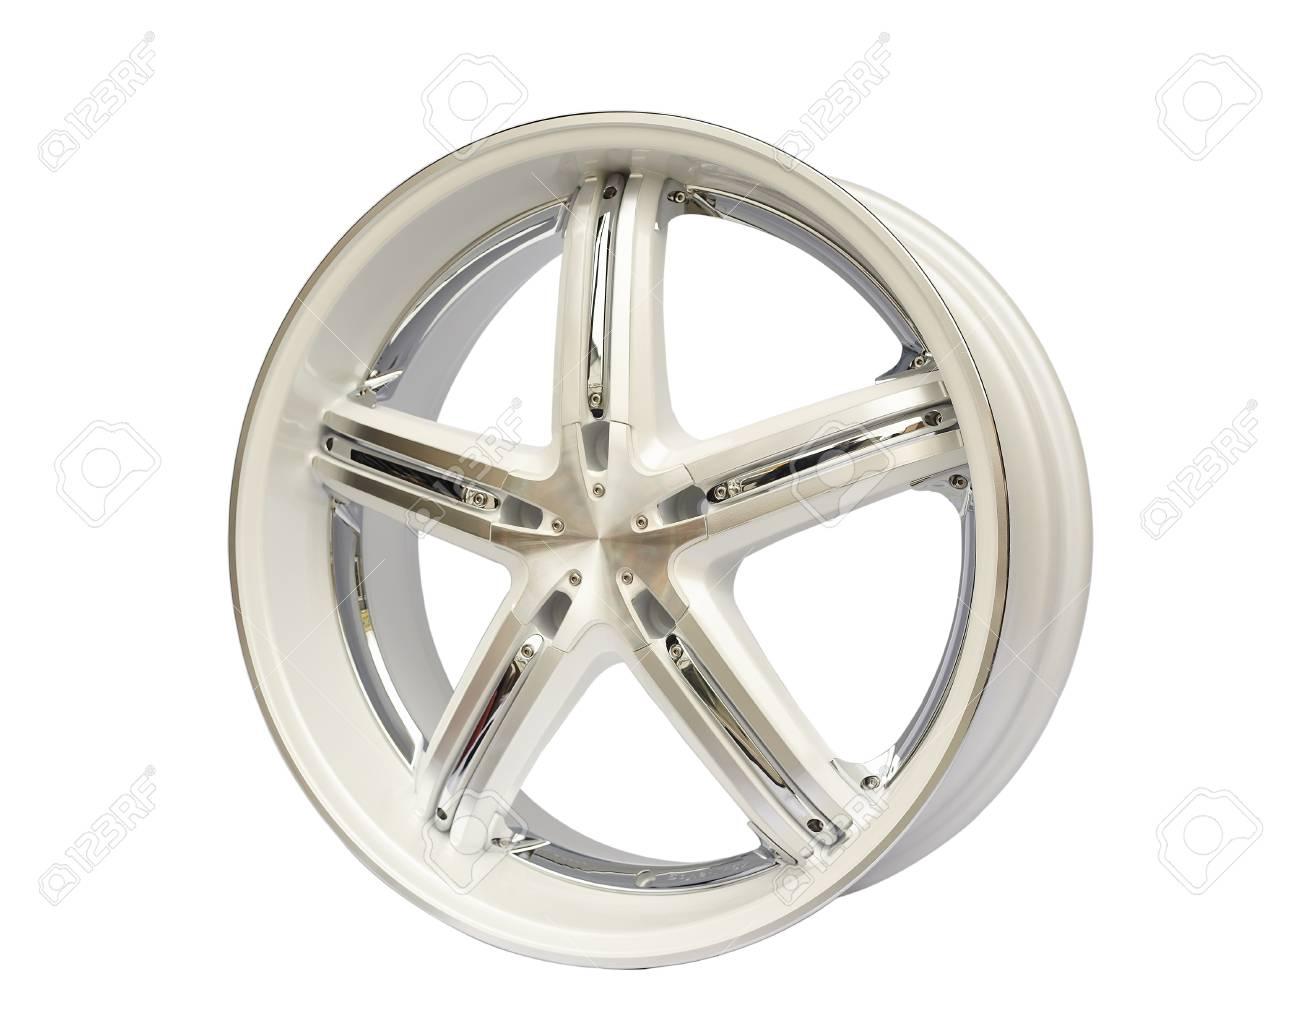 aluminium steel wheel against white background Stock Photo - 13457260